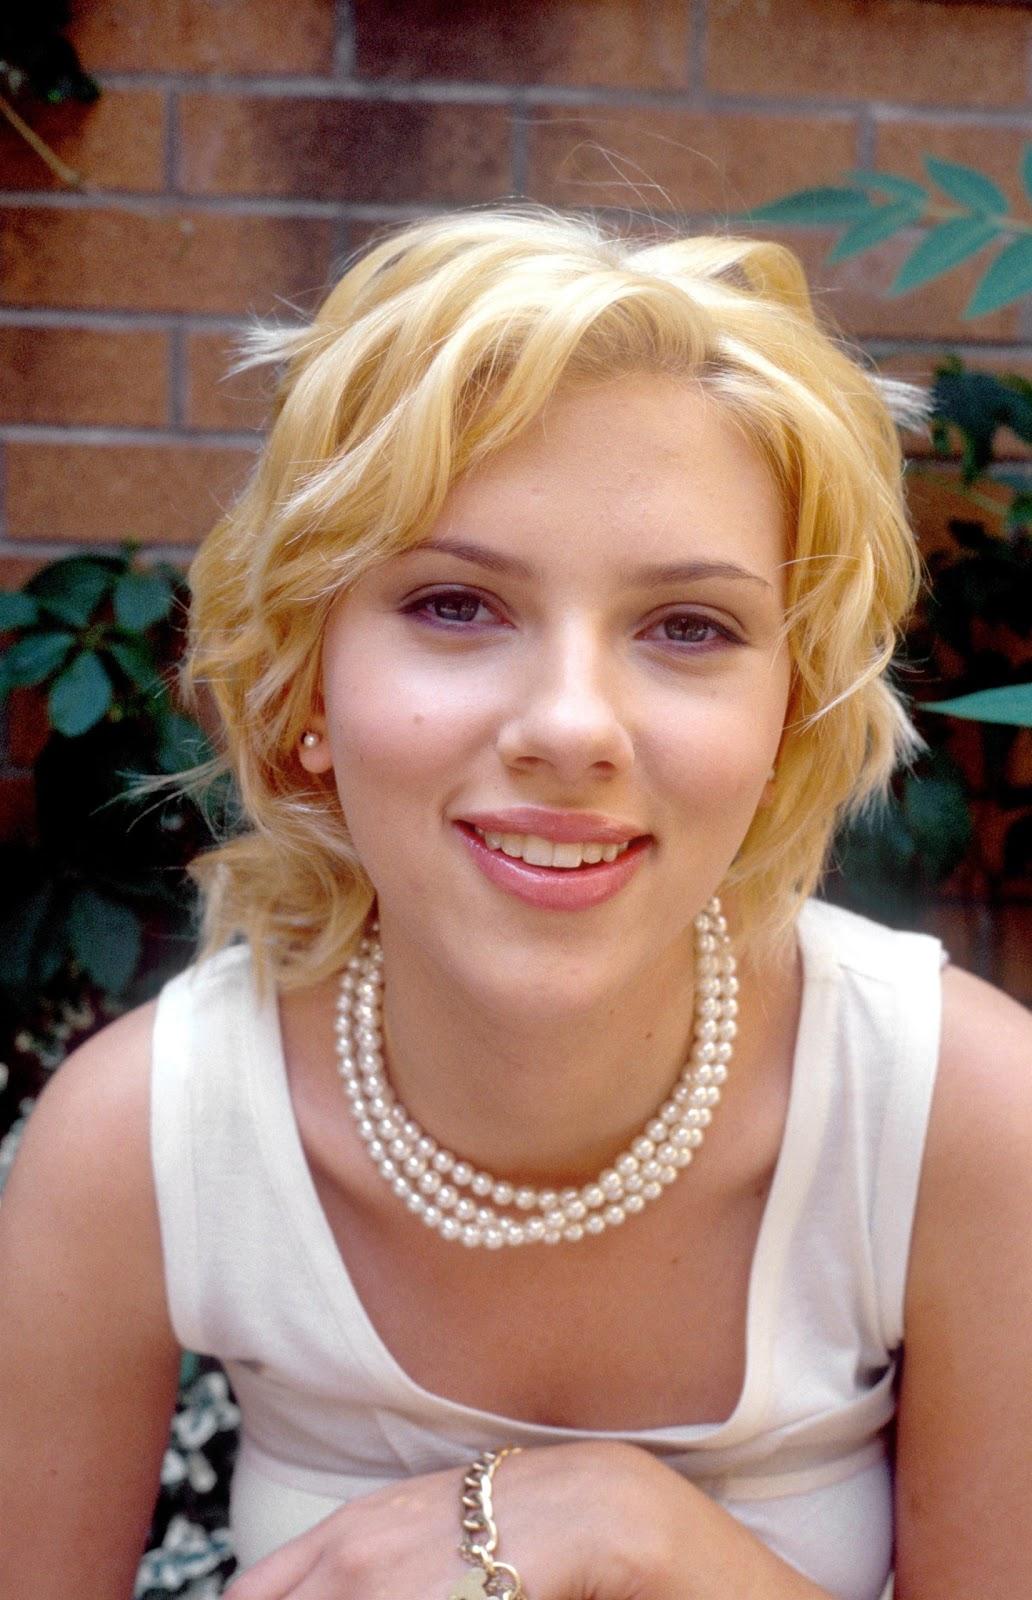 Scarlett johansson pictures gallery 14 film actresses - Scarlett johansson blogspot ...